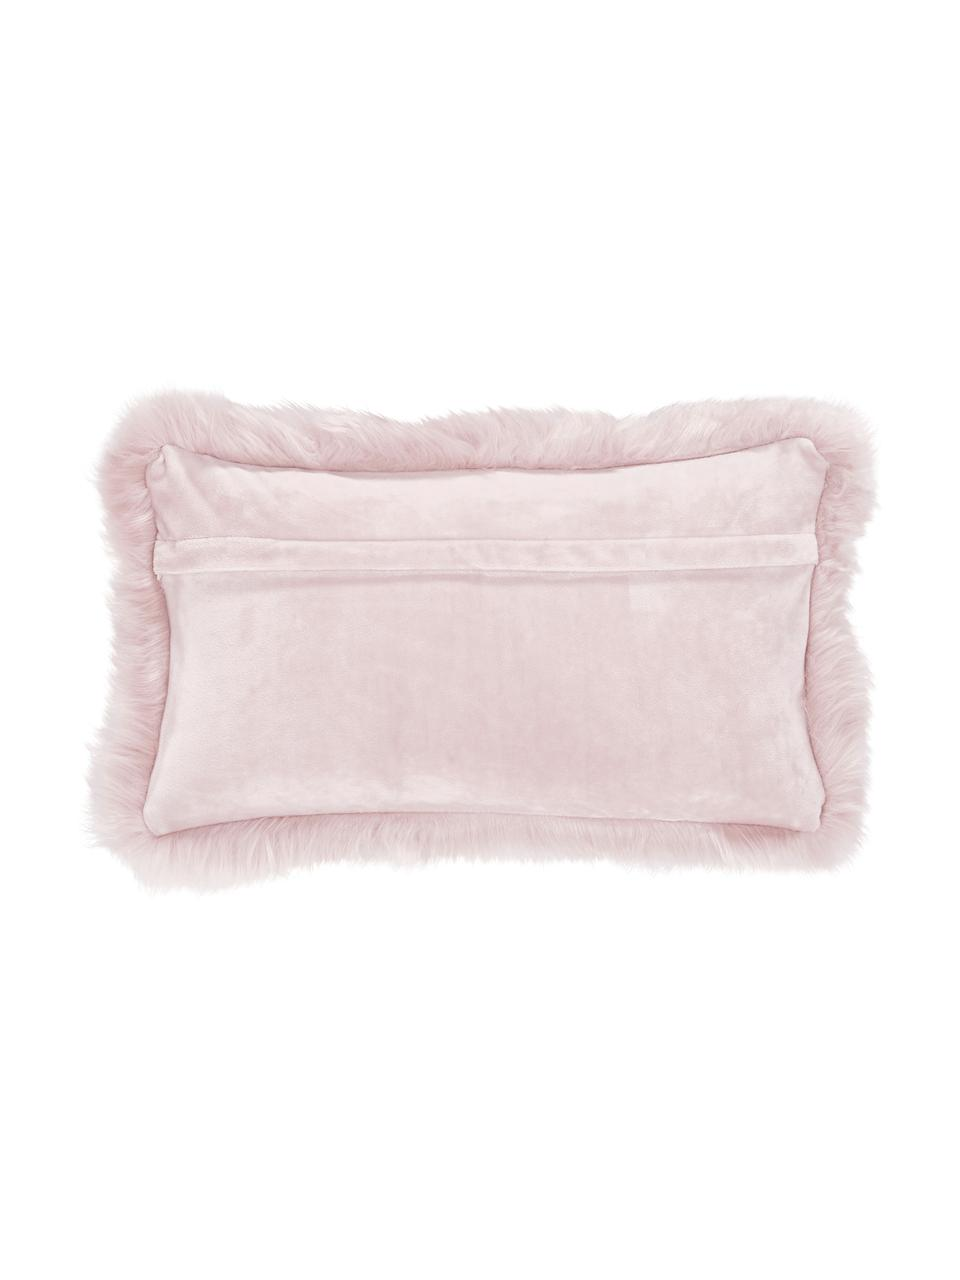 Flauschige Kunstfell-Kissenhülle Mathilde in Rosa, glatt, Vorderseite: 67% Akryl, 33% Polyester, Rückseite: 100% Polyester, Rosa, 30 x 50 cm